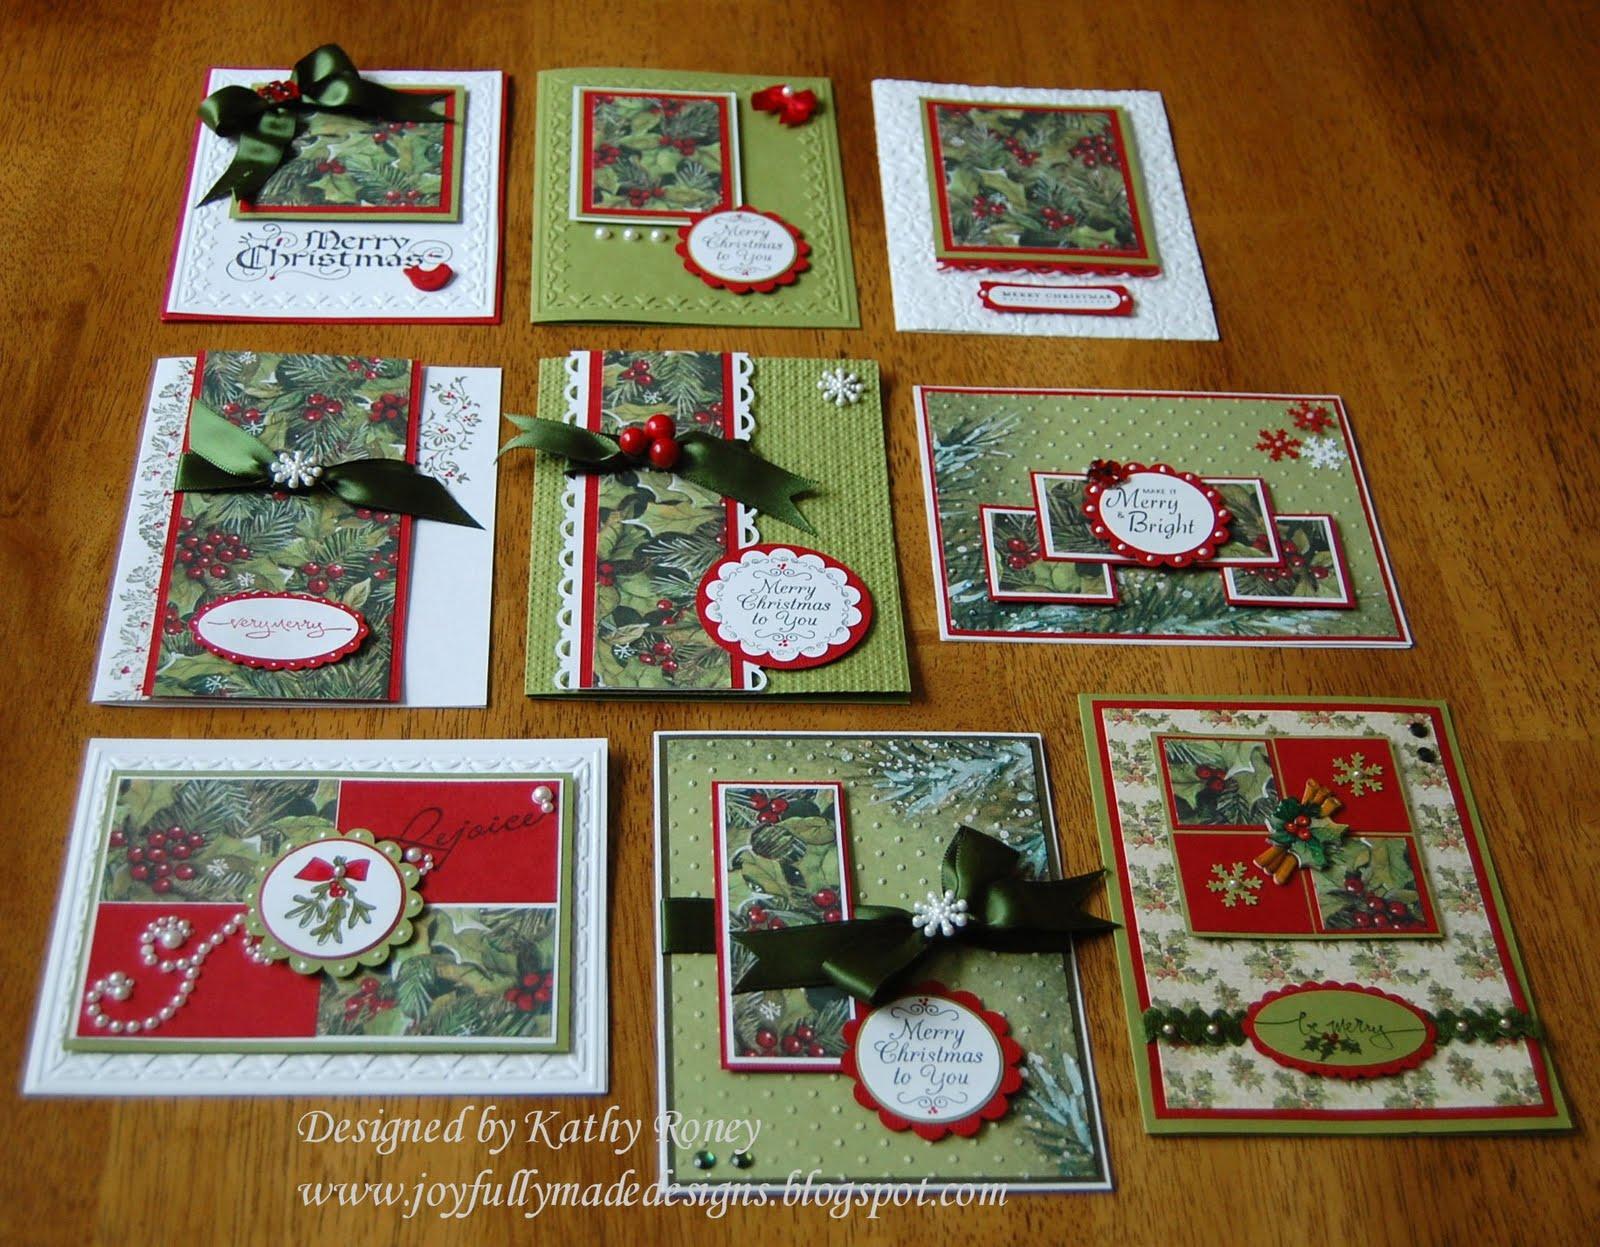 Joyfully Made Designs: Christmas One Sheet Wonder 8 x 8 - photo#42